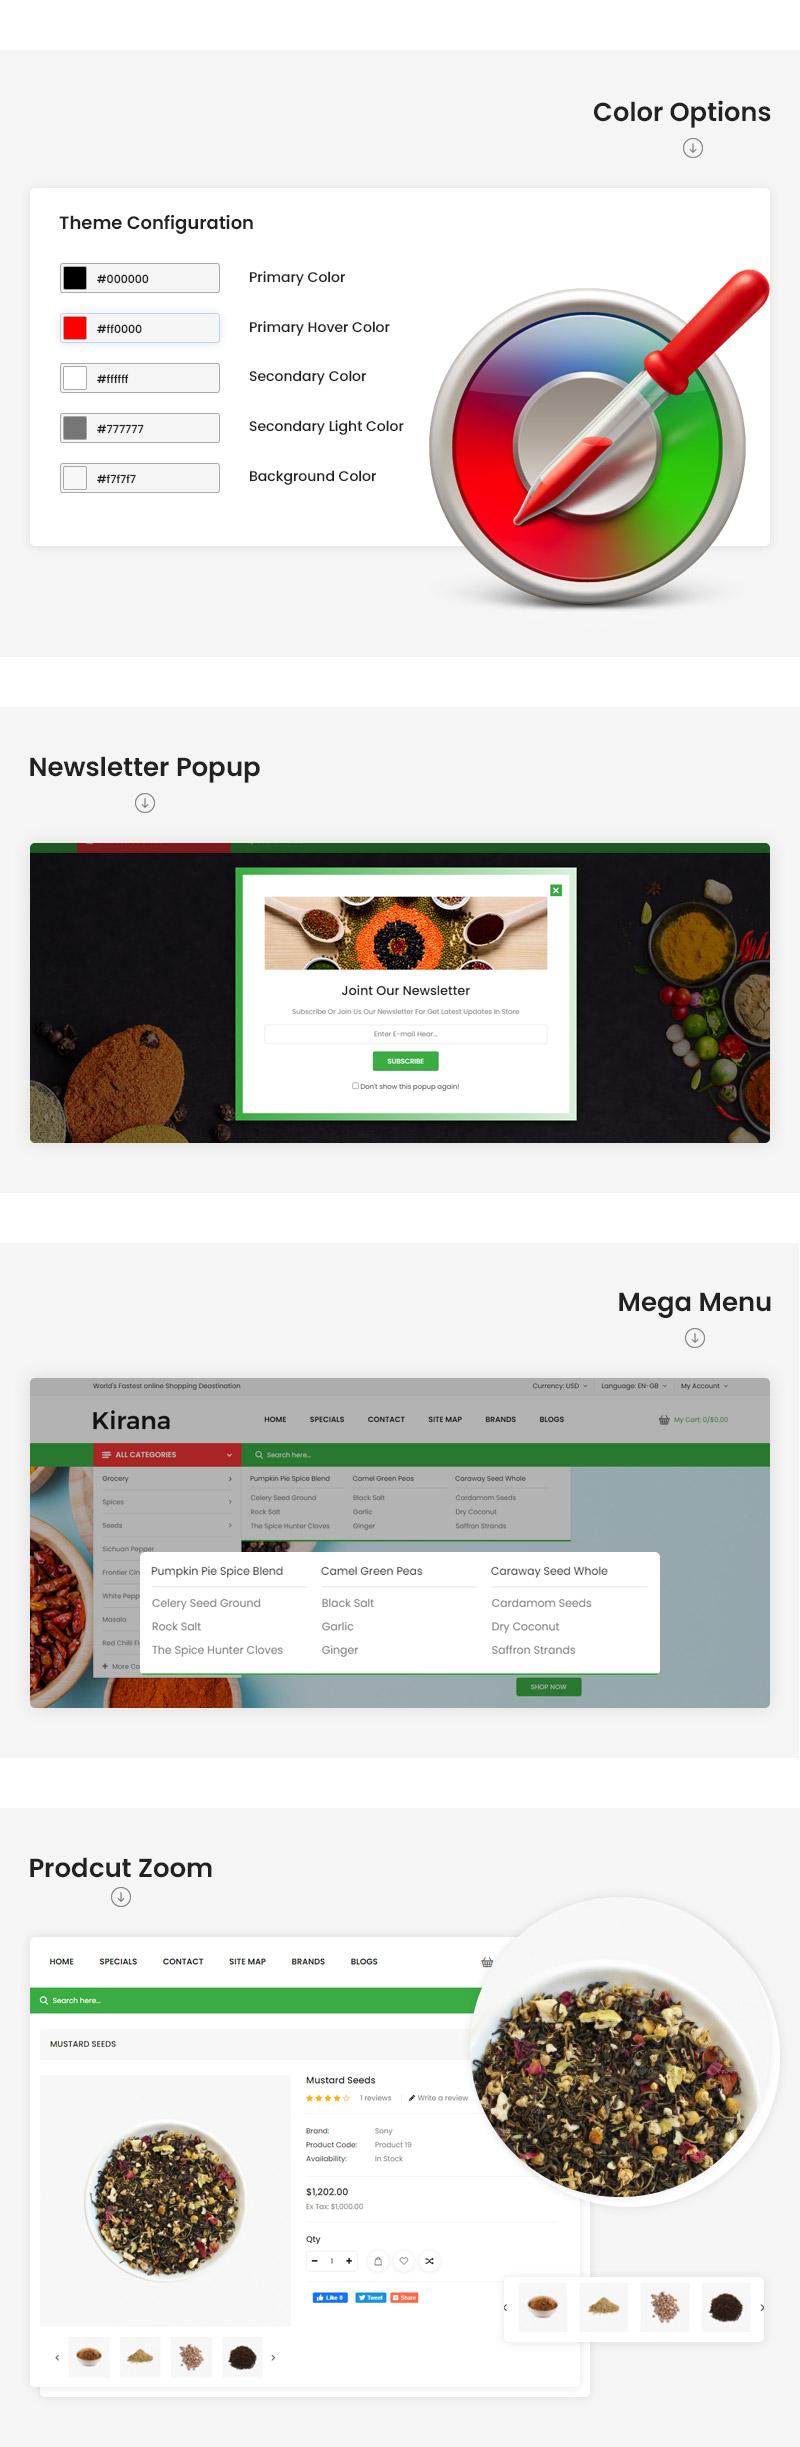 kirana-features-3.jpg